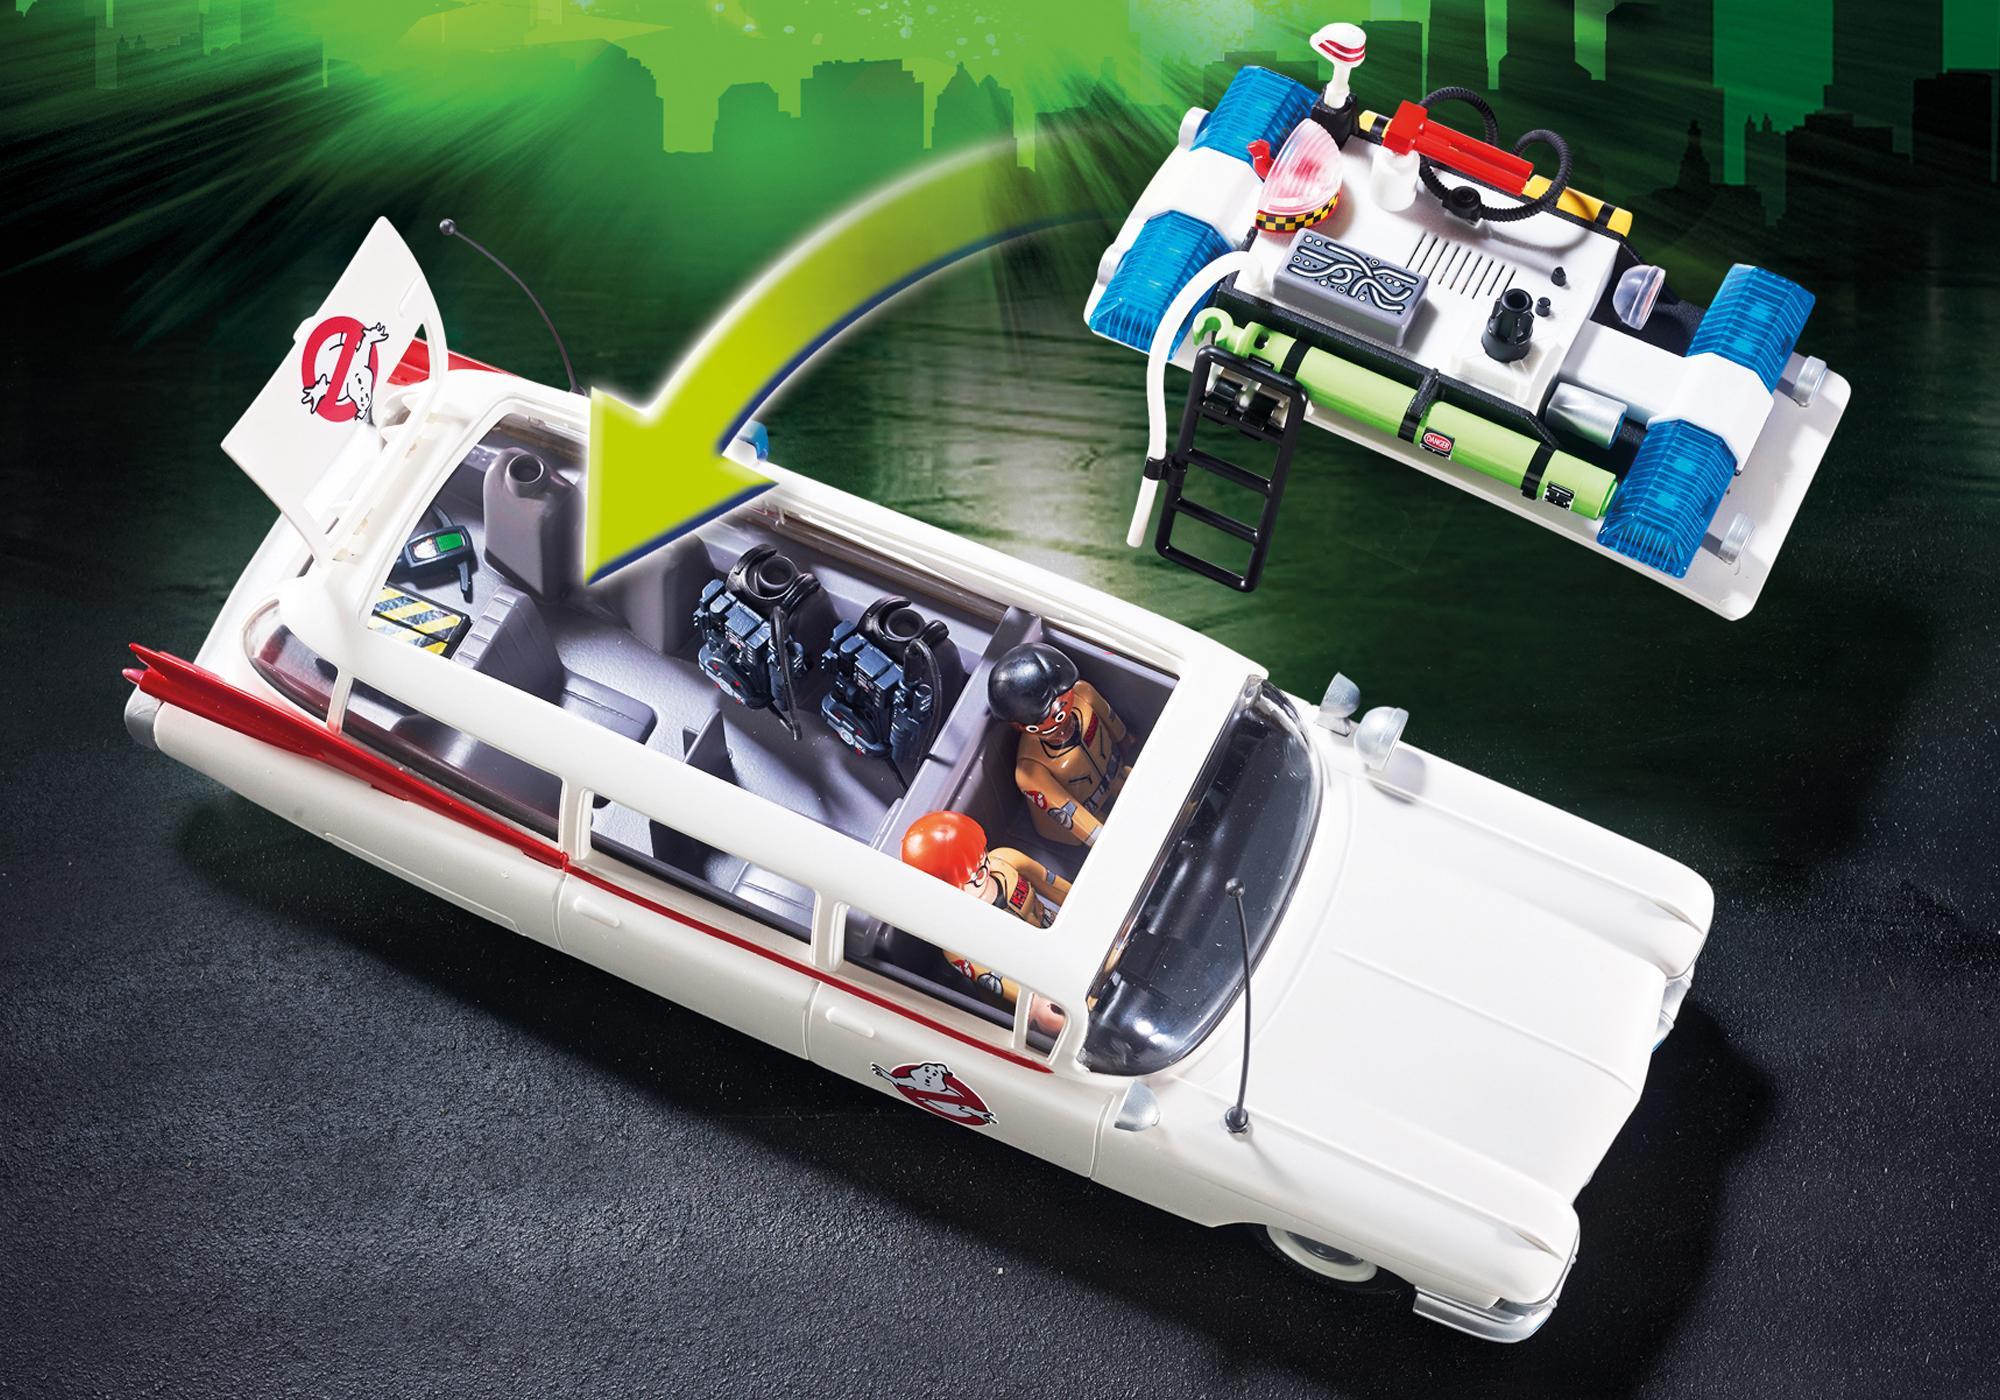 http://media.playmobil.com/i/playmobil/9220_product_extra2/Ghostbusters Ecto-1